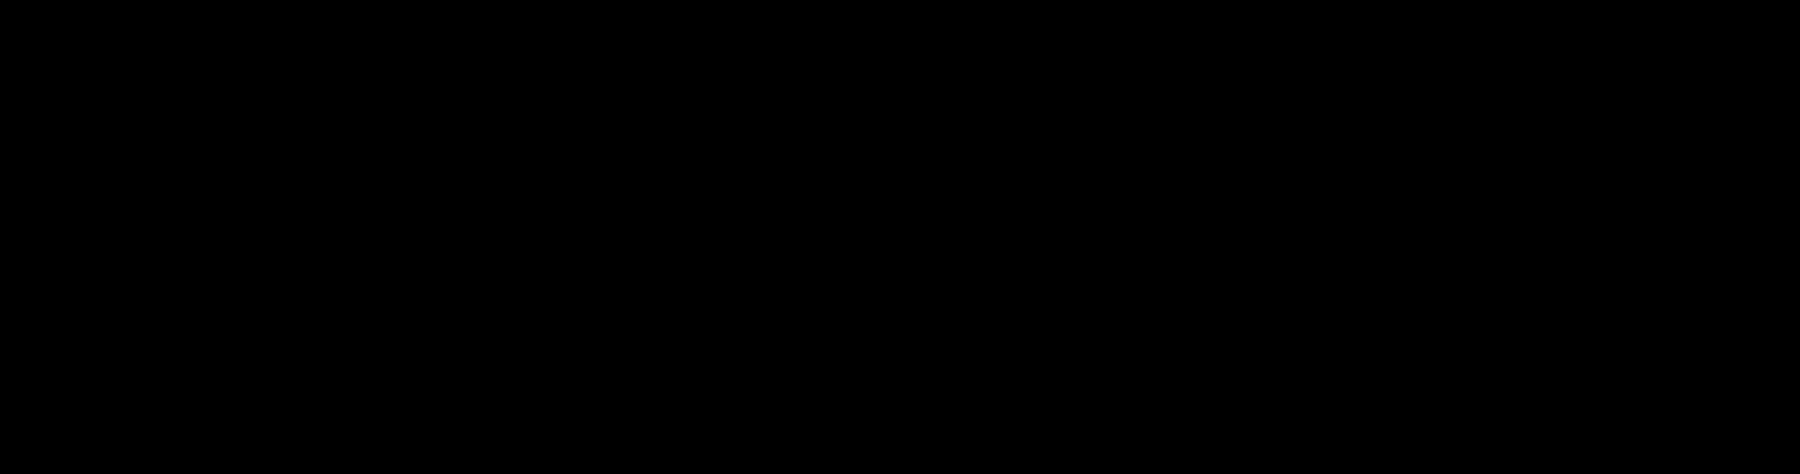 Loupedeck